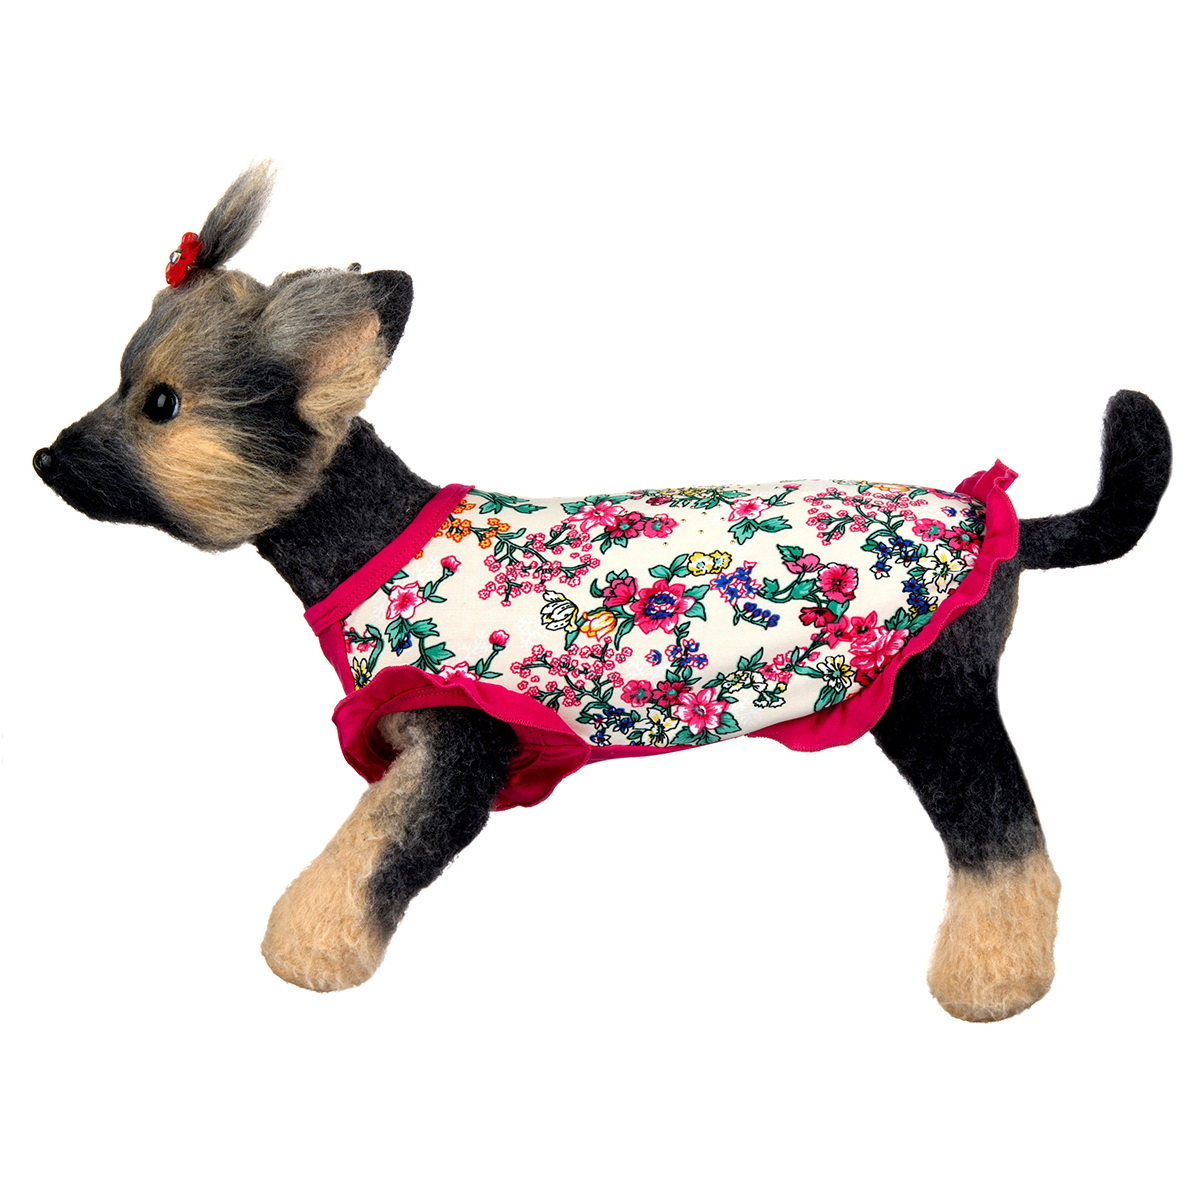 "Майка для собак Dogmoda ""Оливия"", для девочки. Размер 1 (S)"